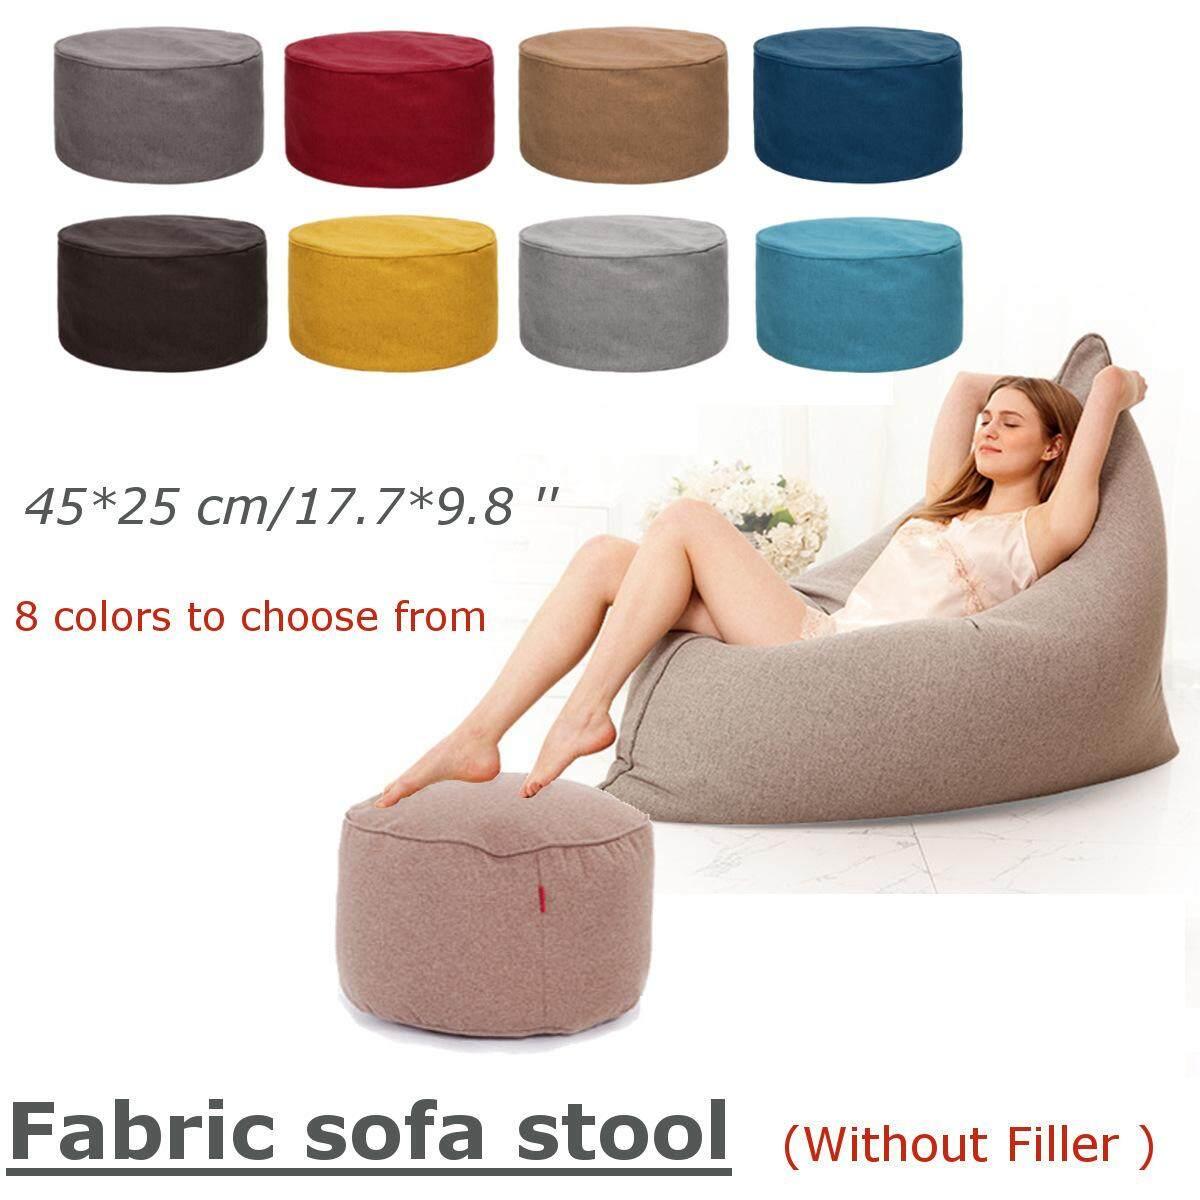 Terbaru Warna Solid Katun Lembut Tas Kacang Sofa Penutup Dipan Santai Bisa Dicuci Tanpa Filler By Freebang.